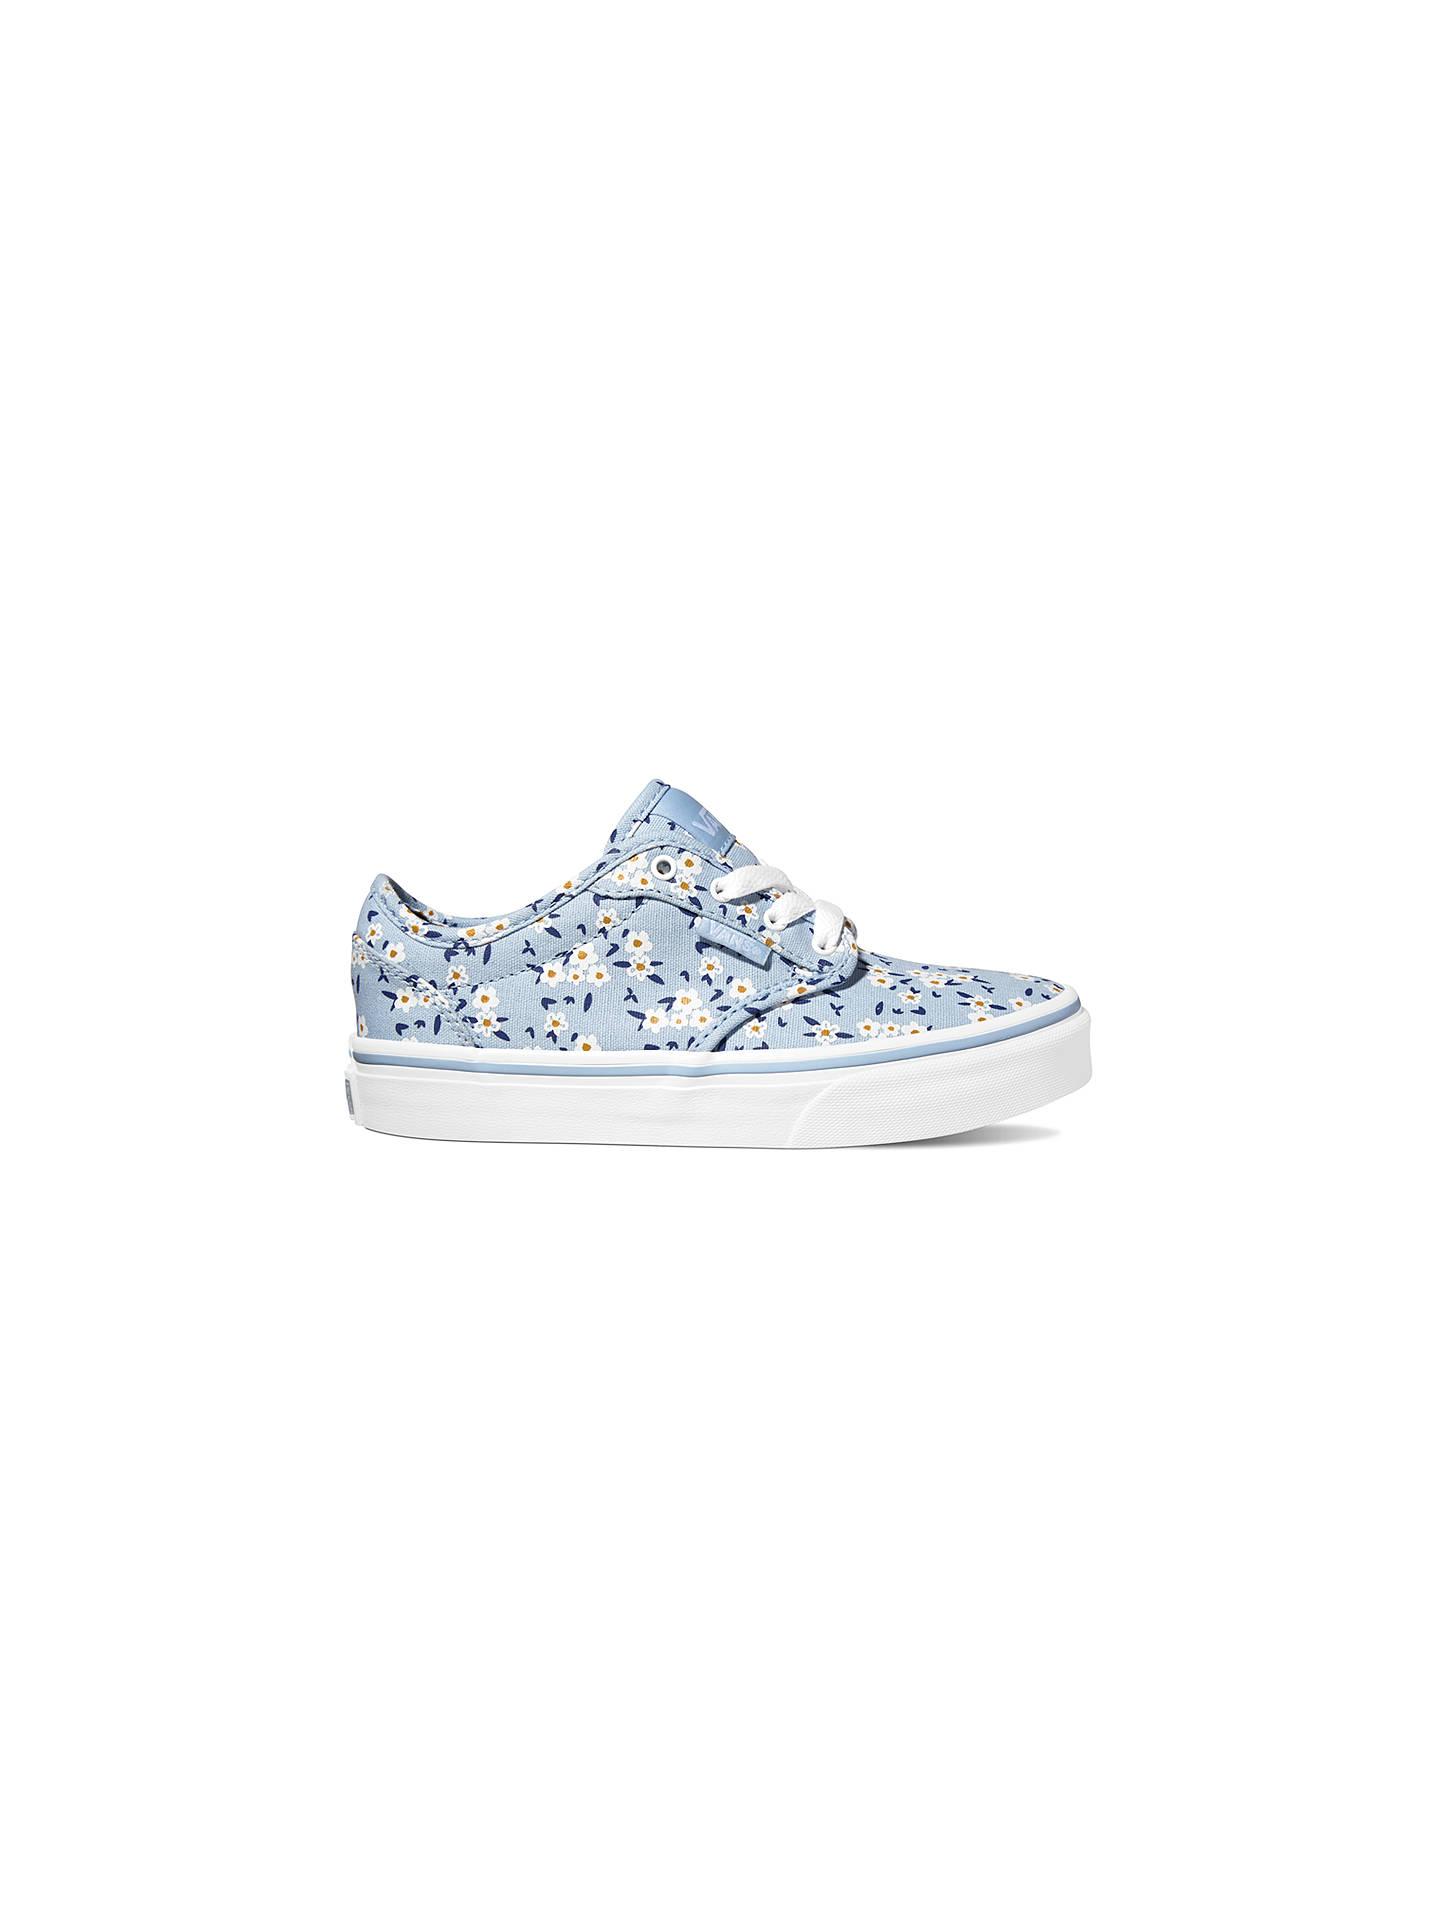 2ca4e91b02 ... Buy Vans Children s Atwood V Floral Shoes